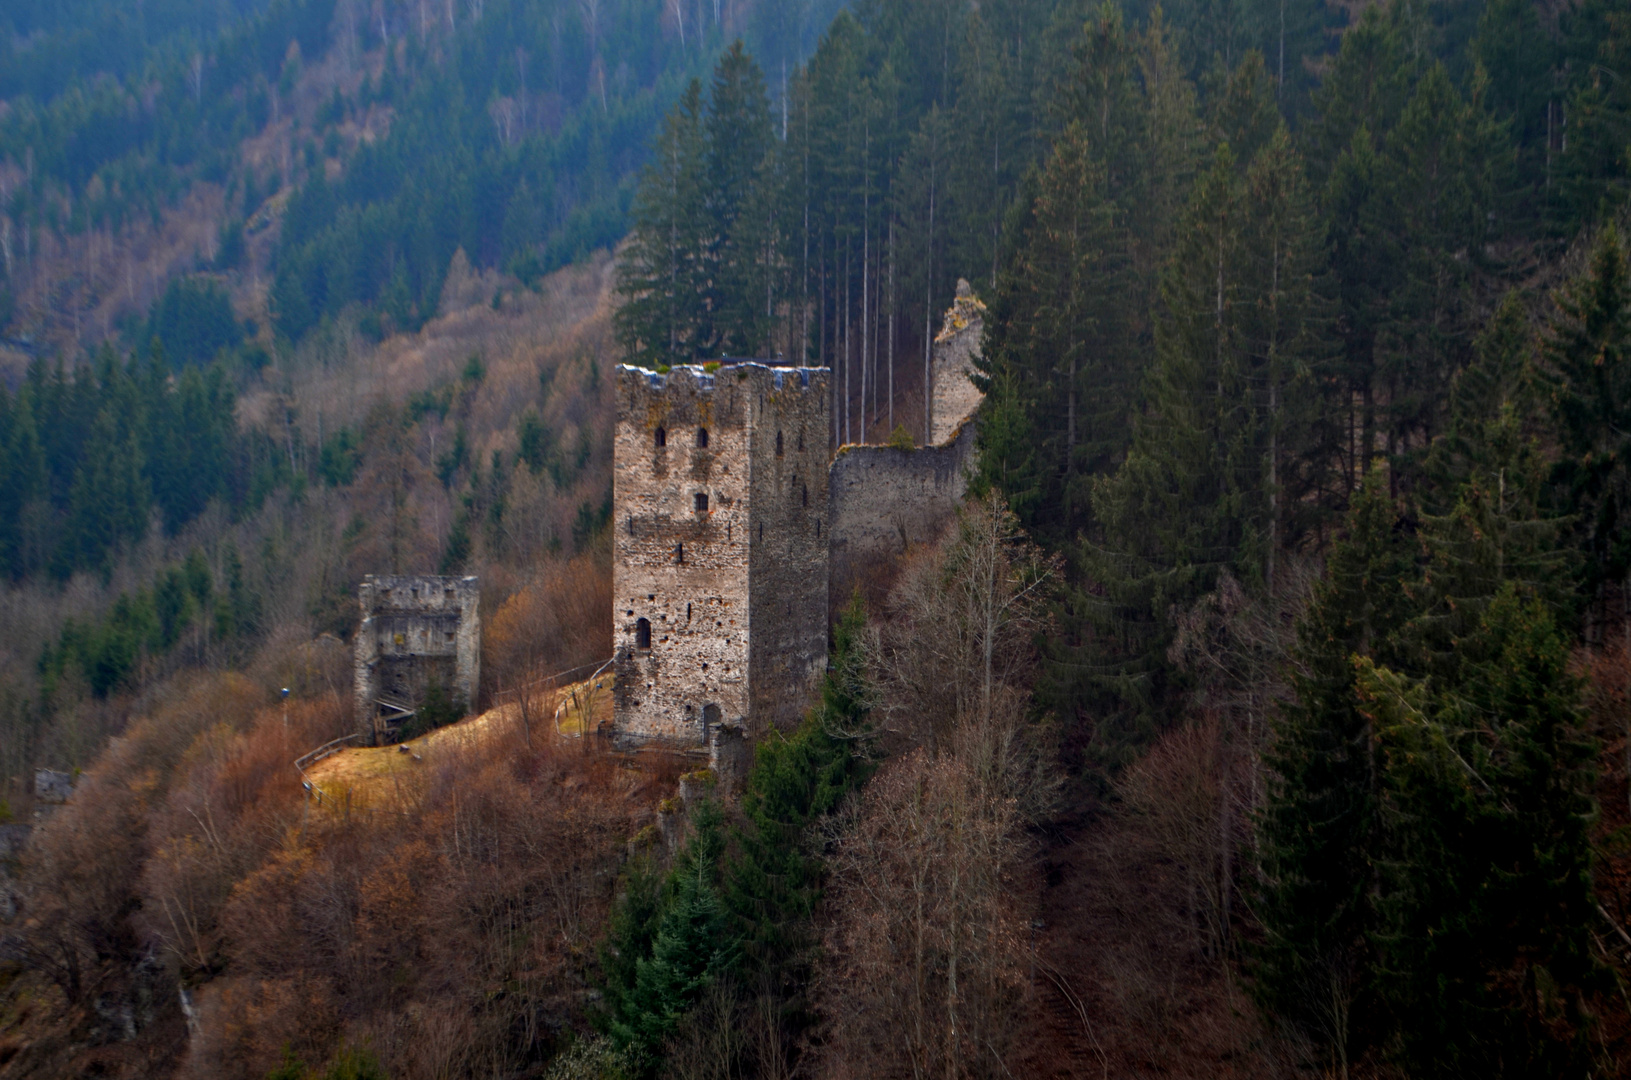 Burgruine ob Friesach in Kärnten